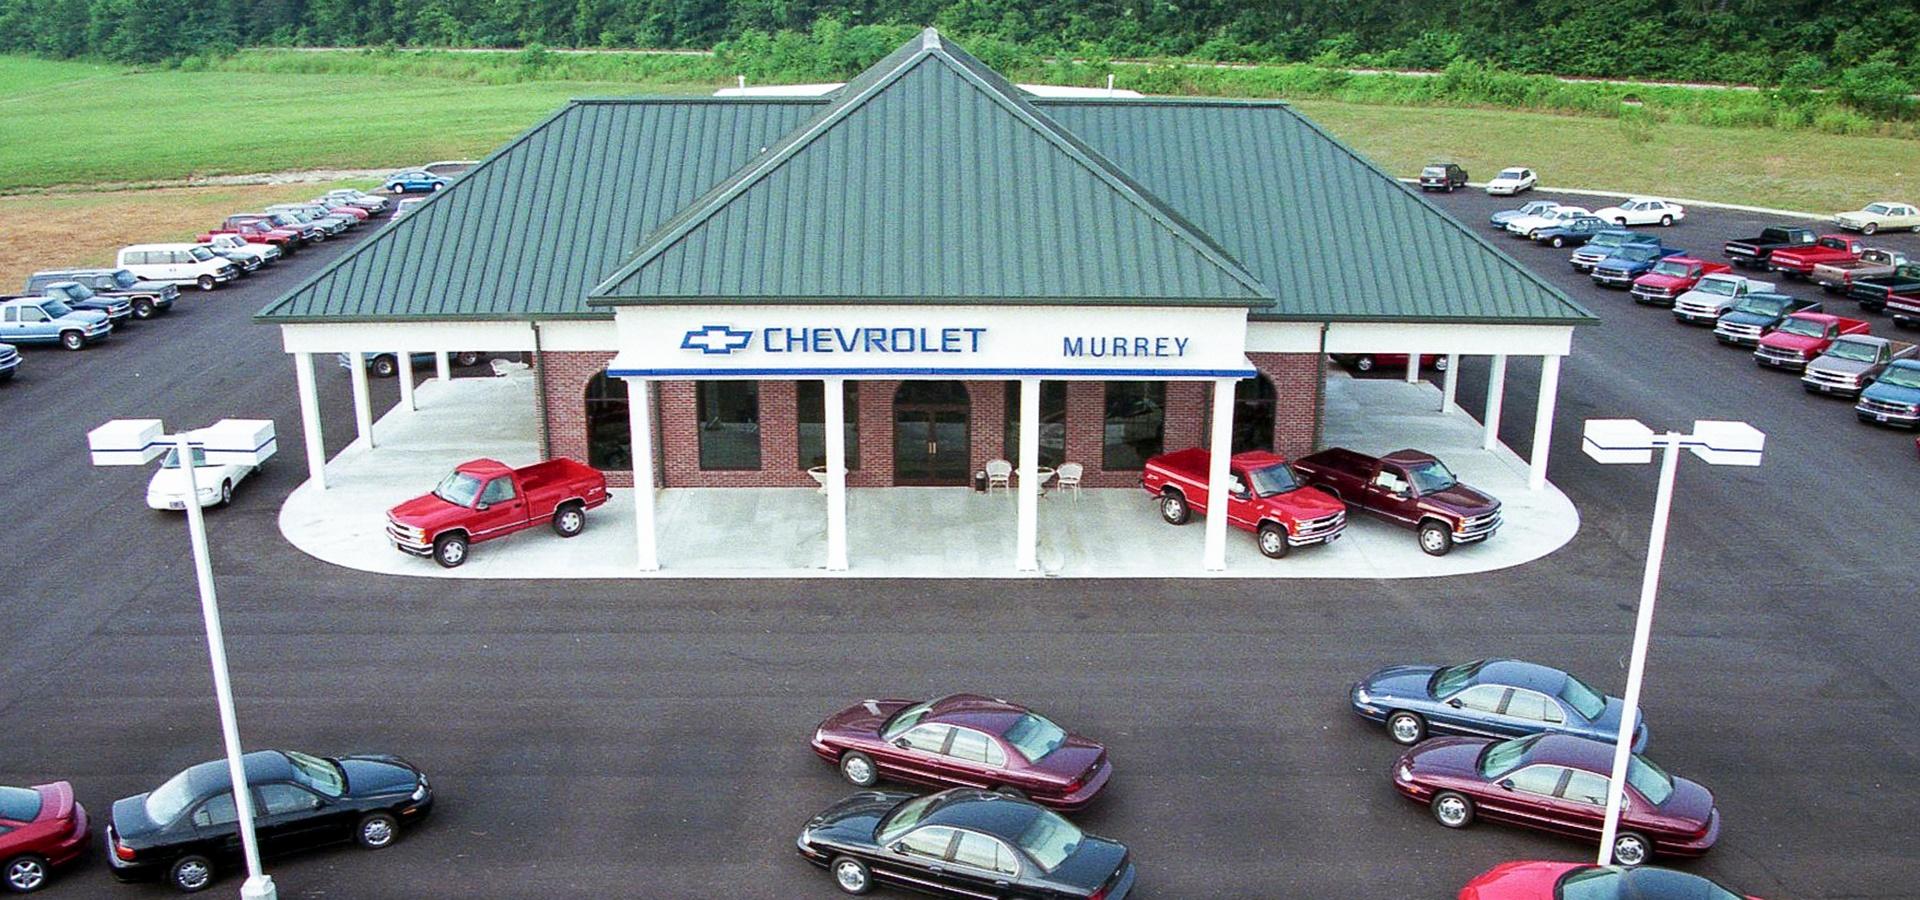 Murry Chevrolet | Pulaski, Tennessee | Brindley Construction, LLC.